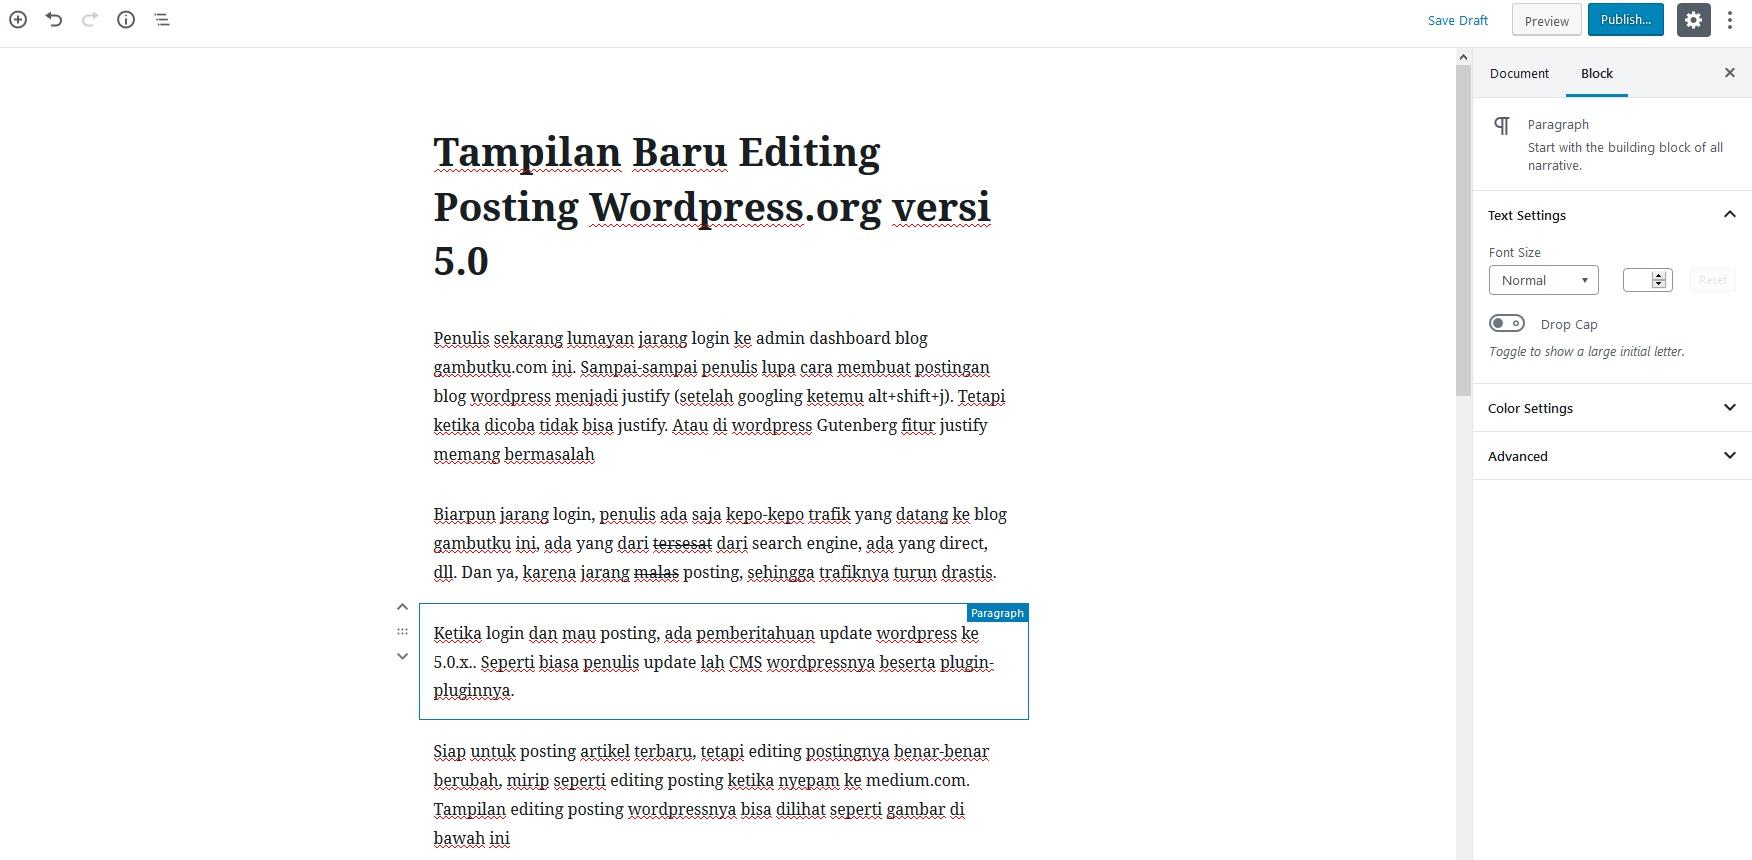 editing posting wordpress 5.0